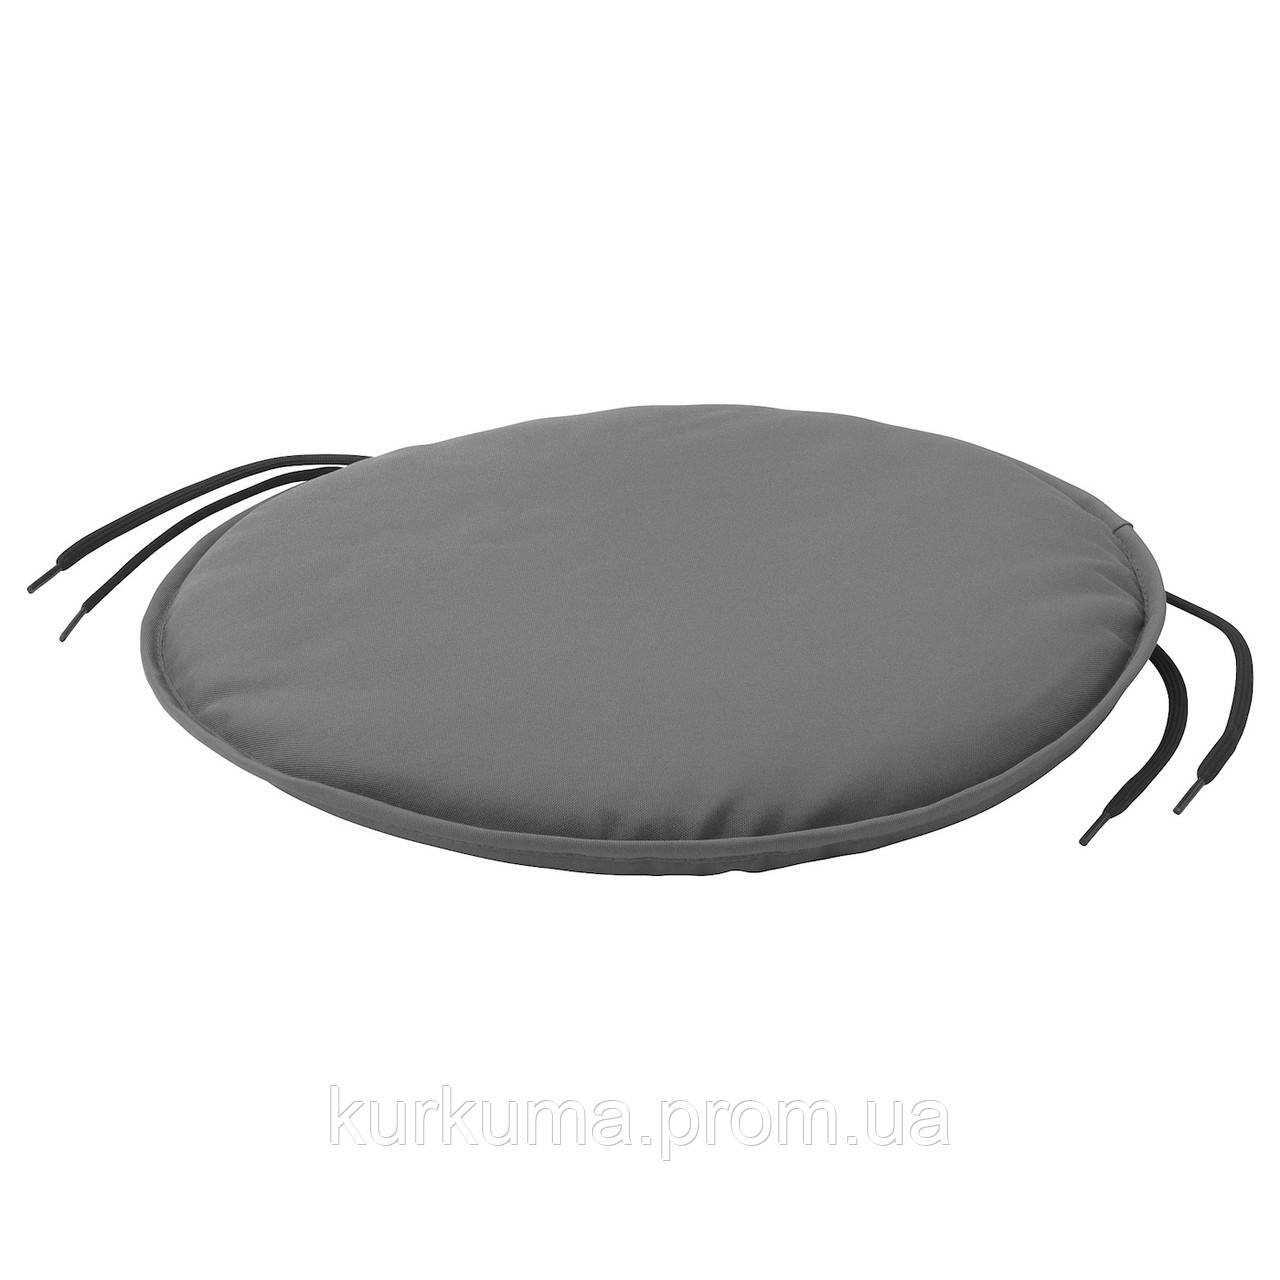 IKEA BENO Подушка для кресла 35 см (903.365.50)